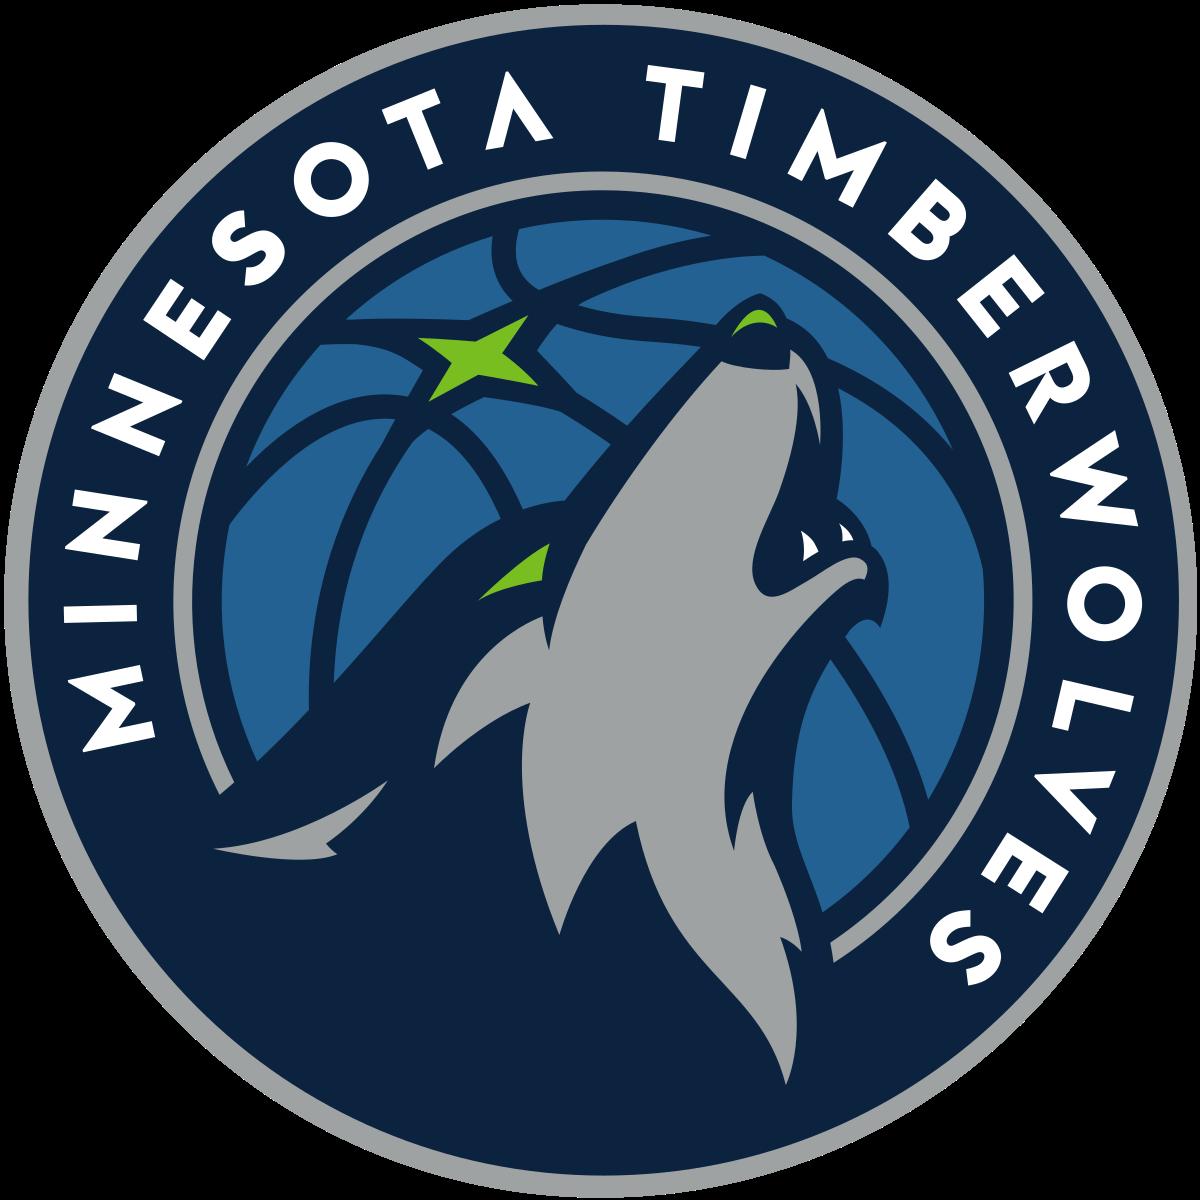 1200px-Minnesota_Timberwolves_logo.svg.png